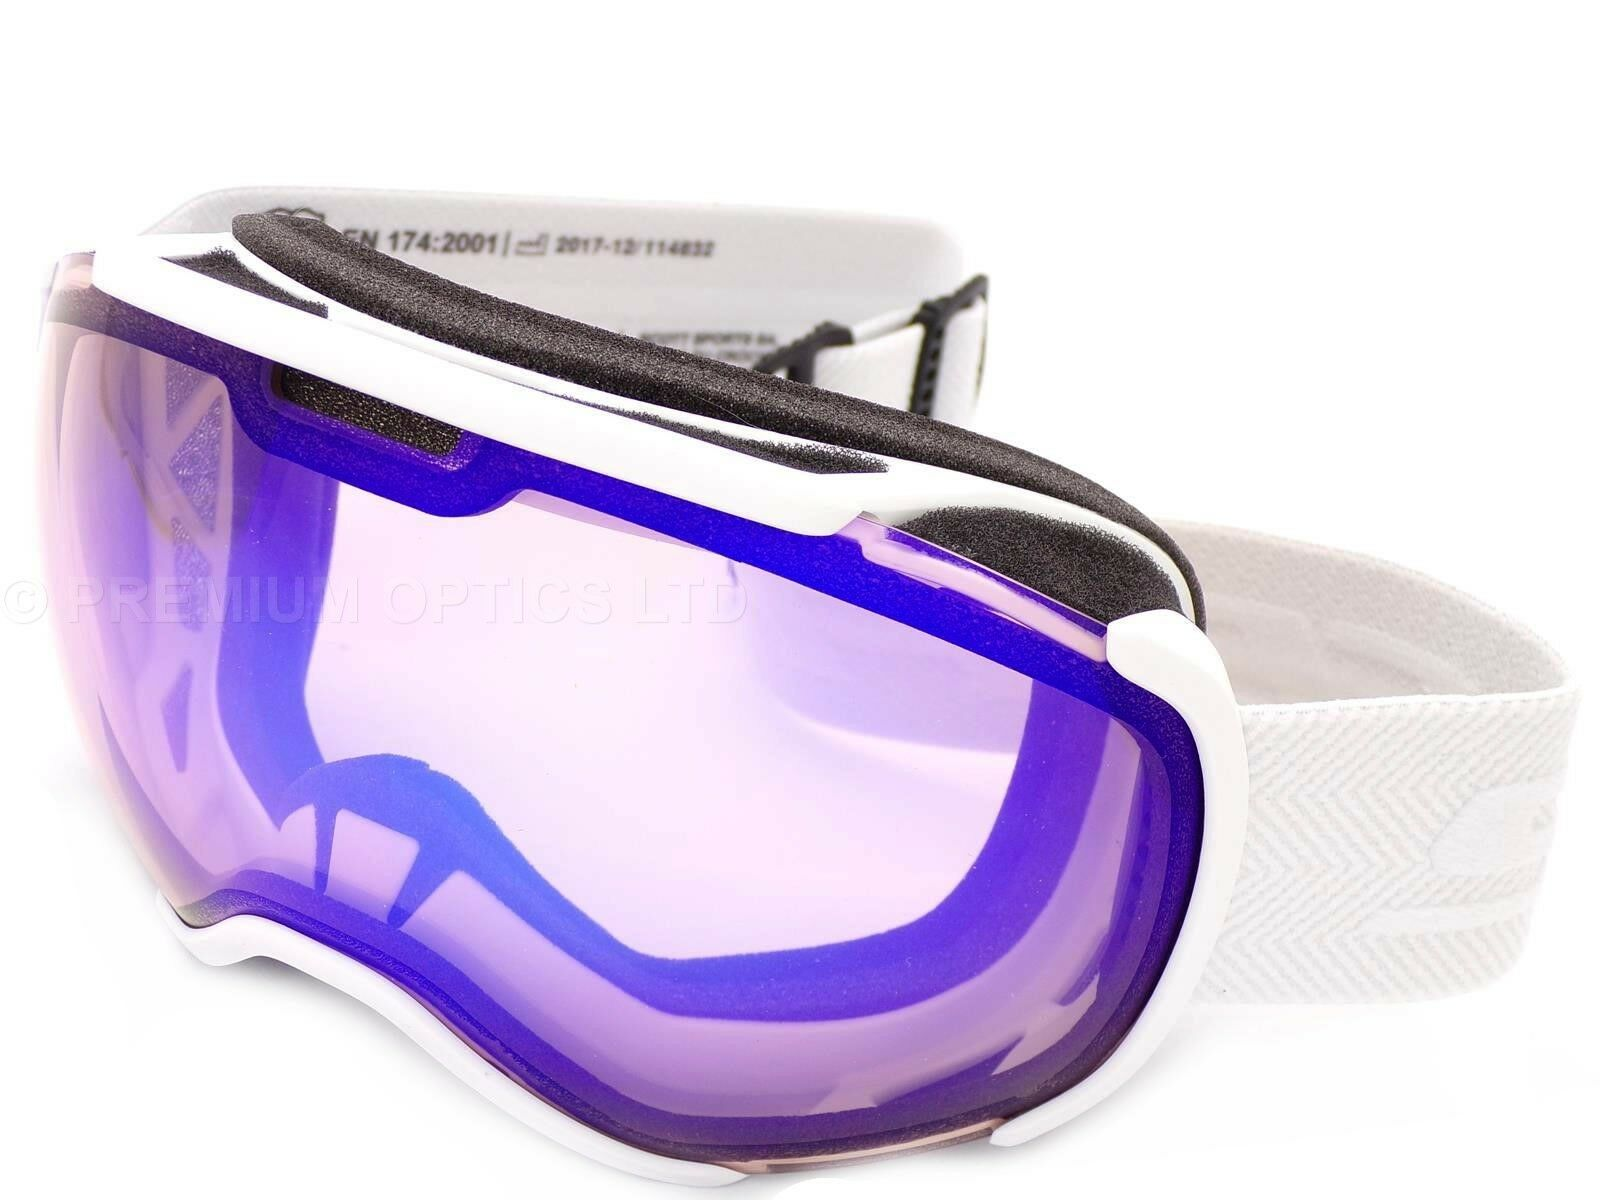 SCOTT - FAZE II White Snow Ski Goggles with Illuminator bluee Chrome Lens 267605